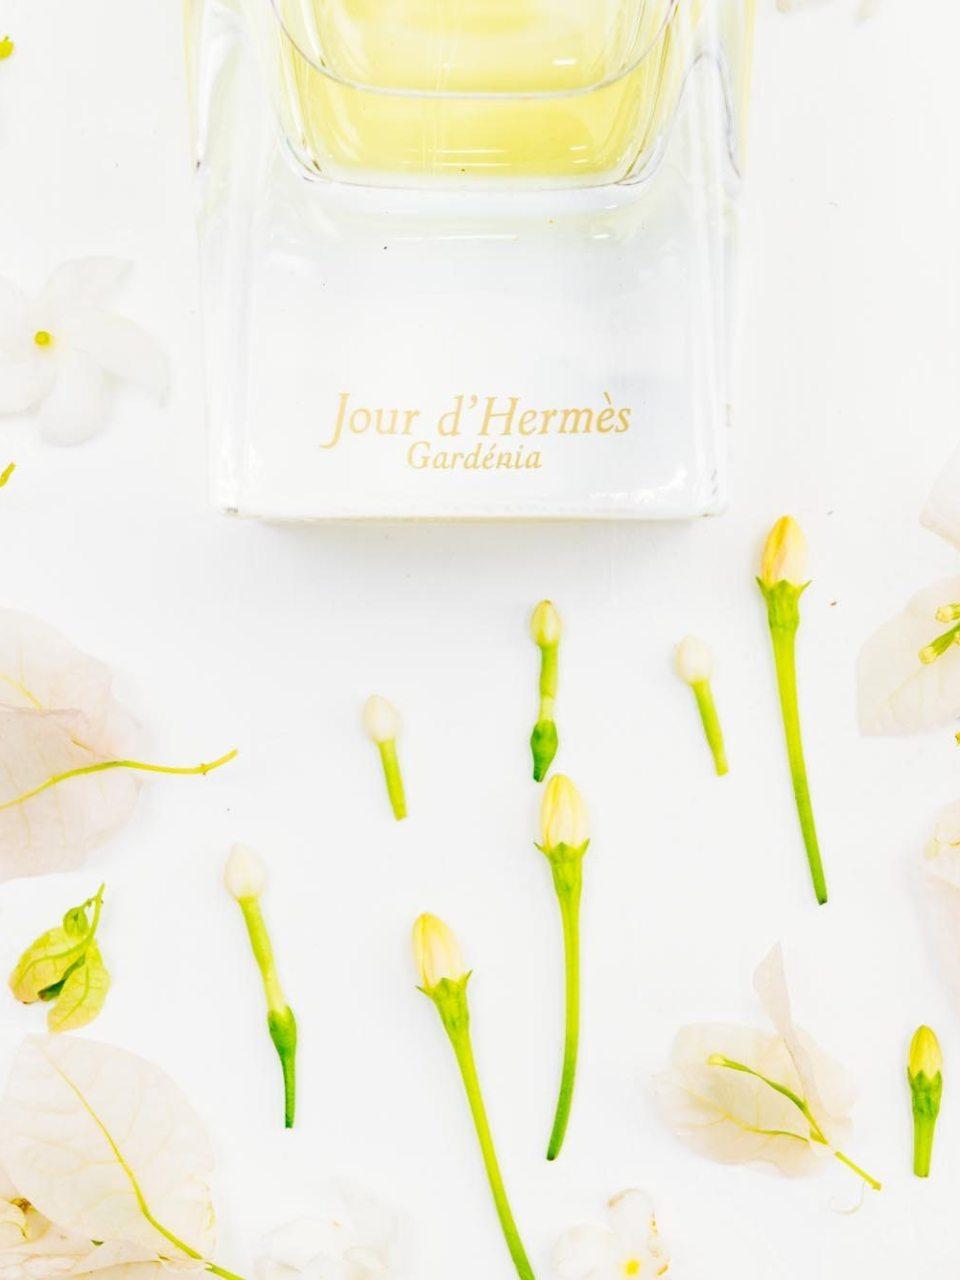 Naina.co, Visual Storyteller, Luxury Brands, Naina Redhu, Professional Photographer, Experience Collector, Luxury Photographer, Luxury Blogger, Lifestyle, Visual Storyteller for Luxury Brands, Jour d'Hermes, Gardenia Perfum, Jean-Claude Ellena, Parfumier, Fresh, Flowery, Fragrance, Perfume, Scent, #FragranceOfTheMonth, FragranceOfTheMonth, Fragrance Of The Month